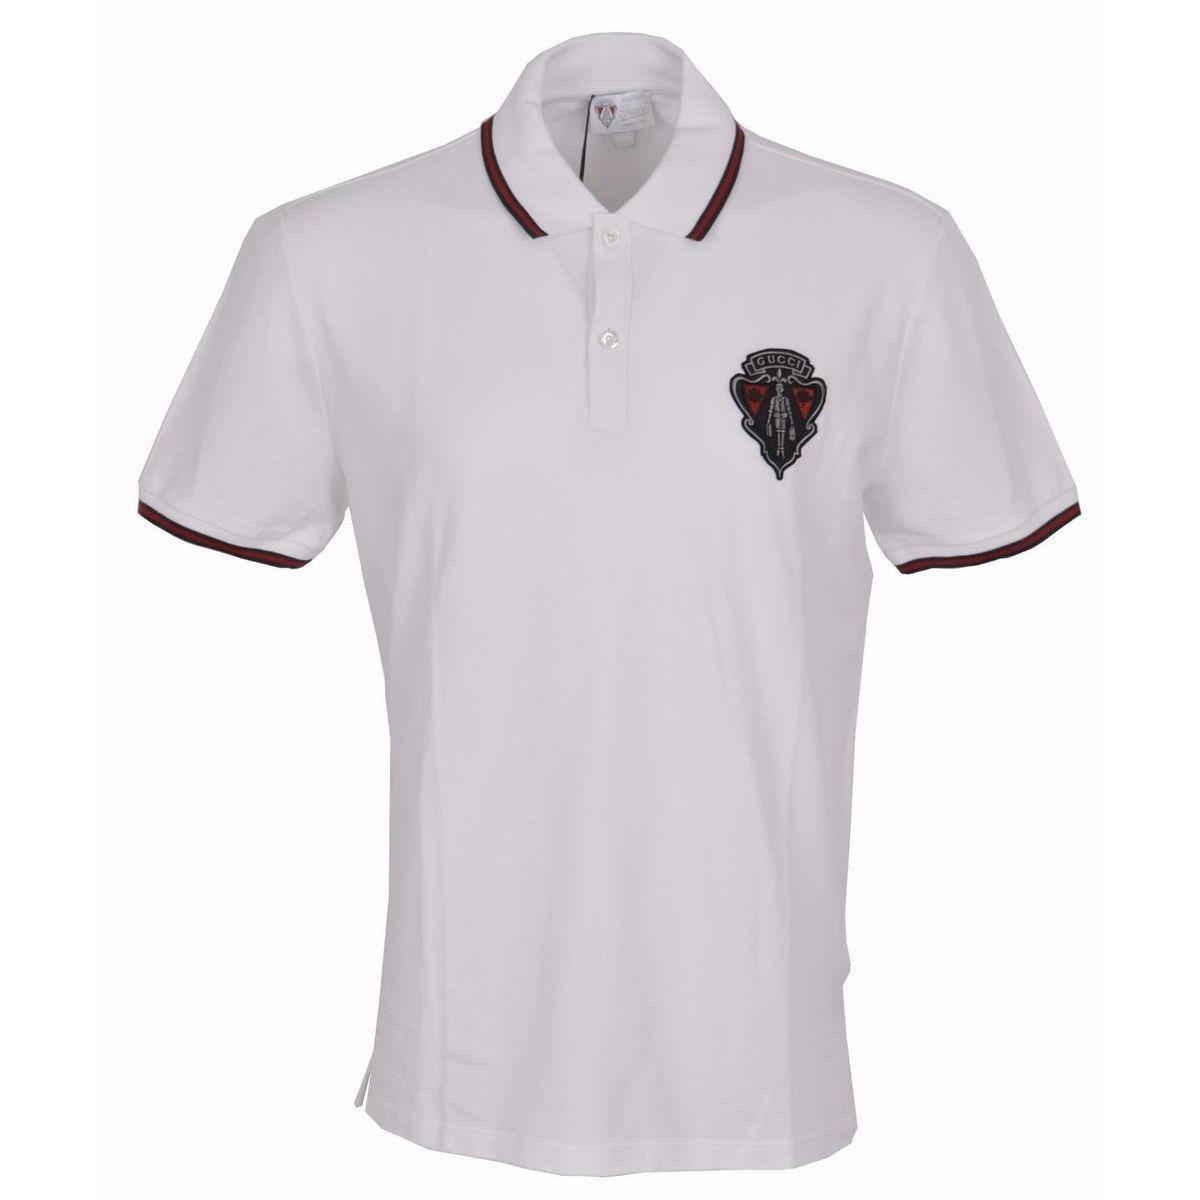 09ec9cc154 New Gucci Men's 345394 Slim Fit Hysteria Crest Web Trim Polo Shirt ...